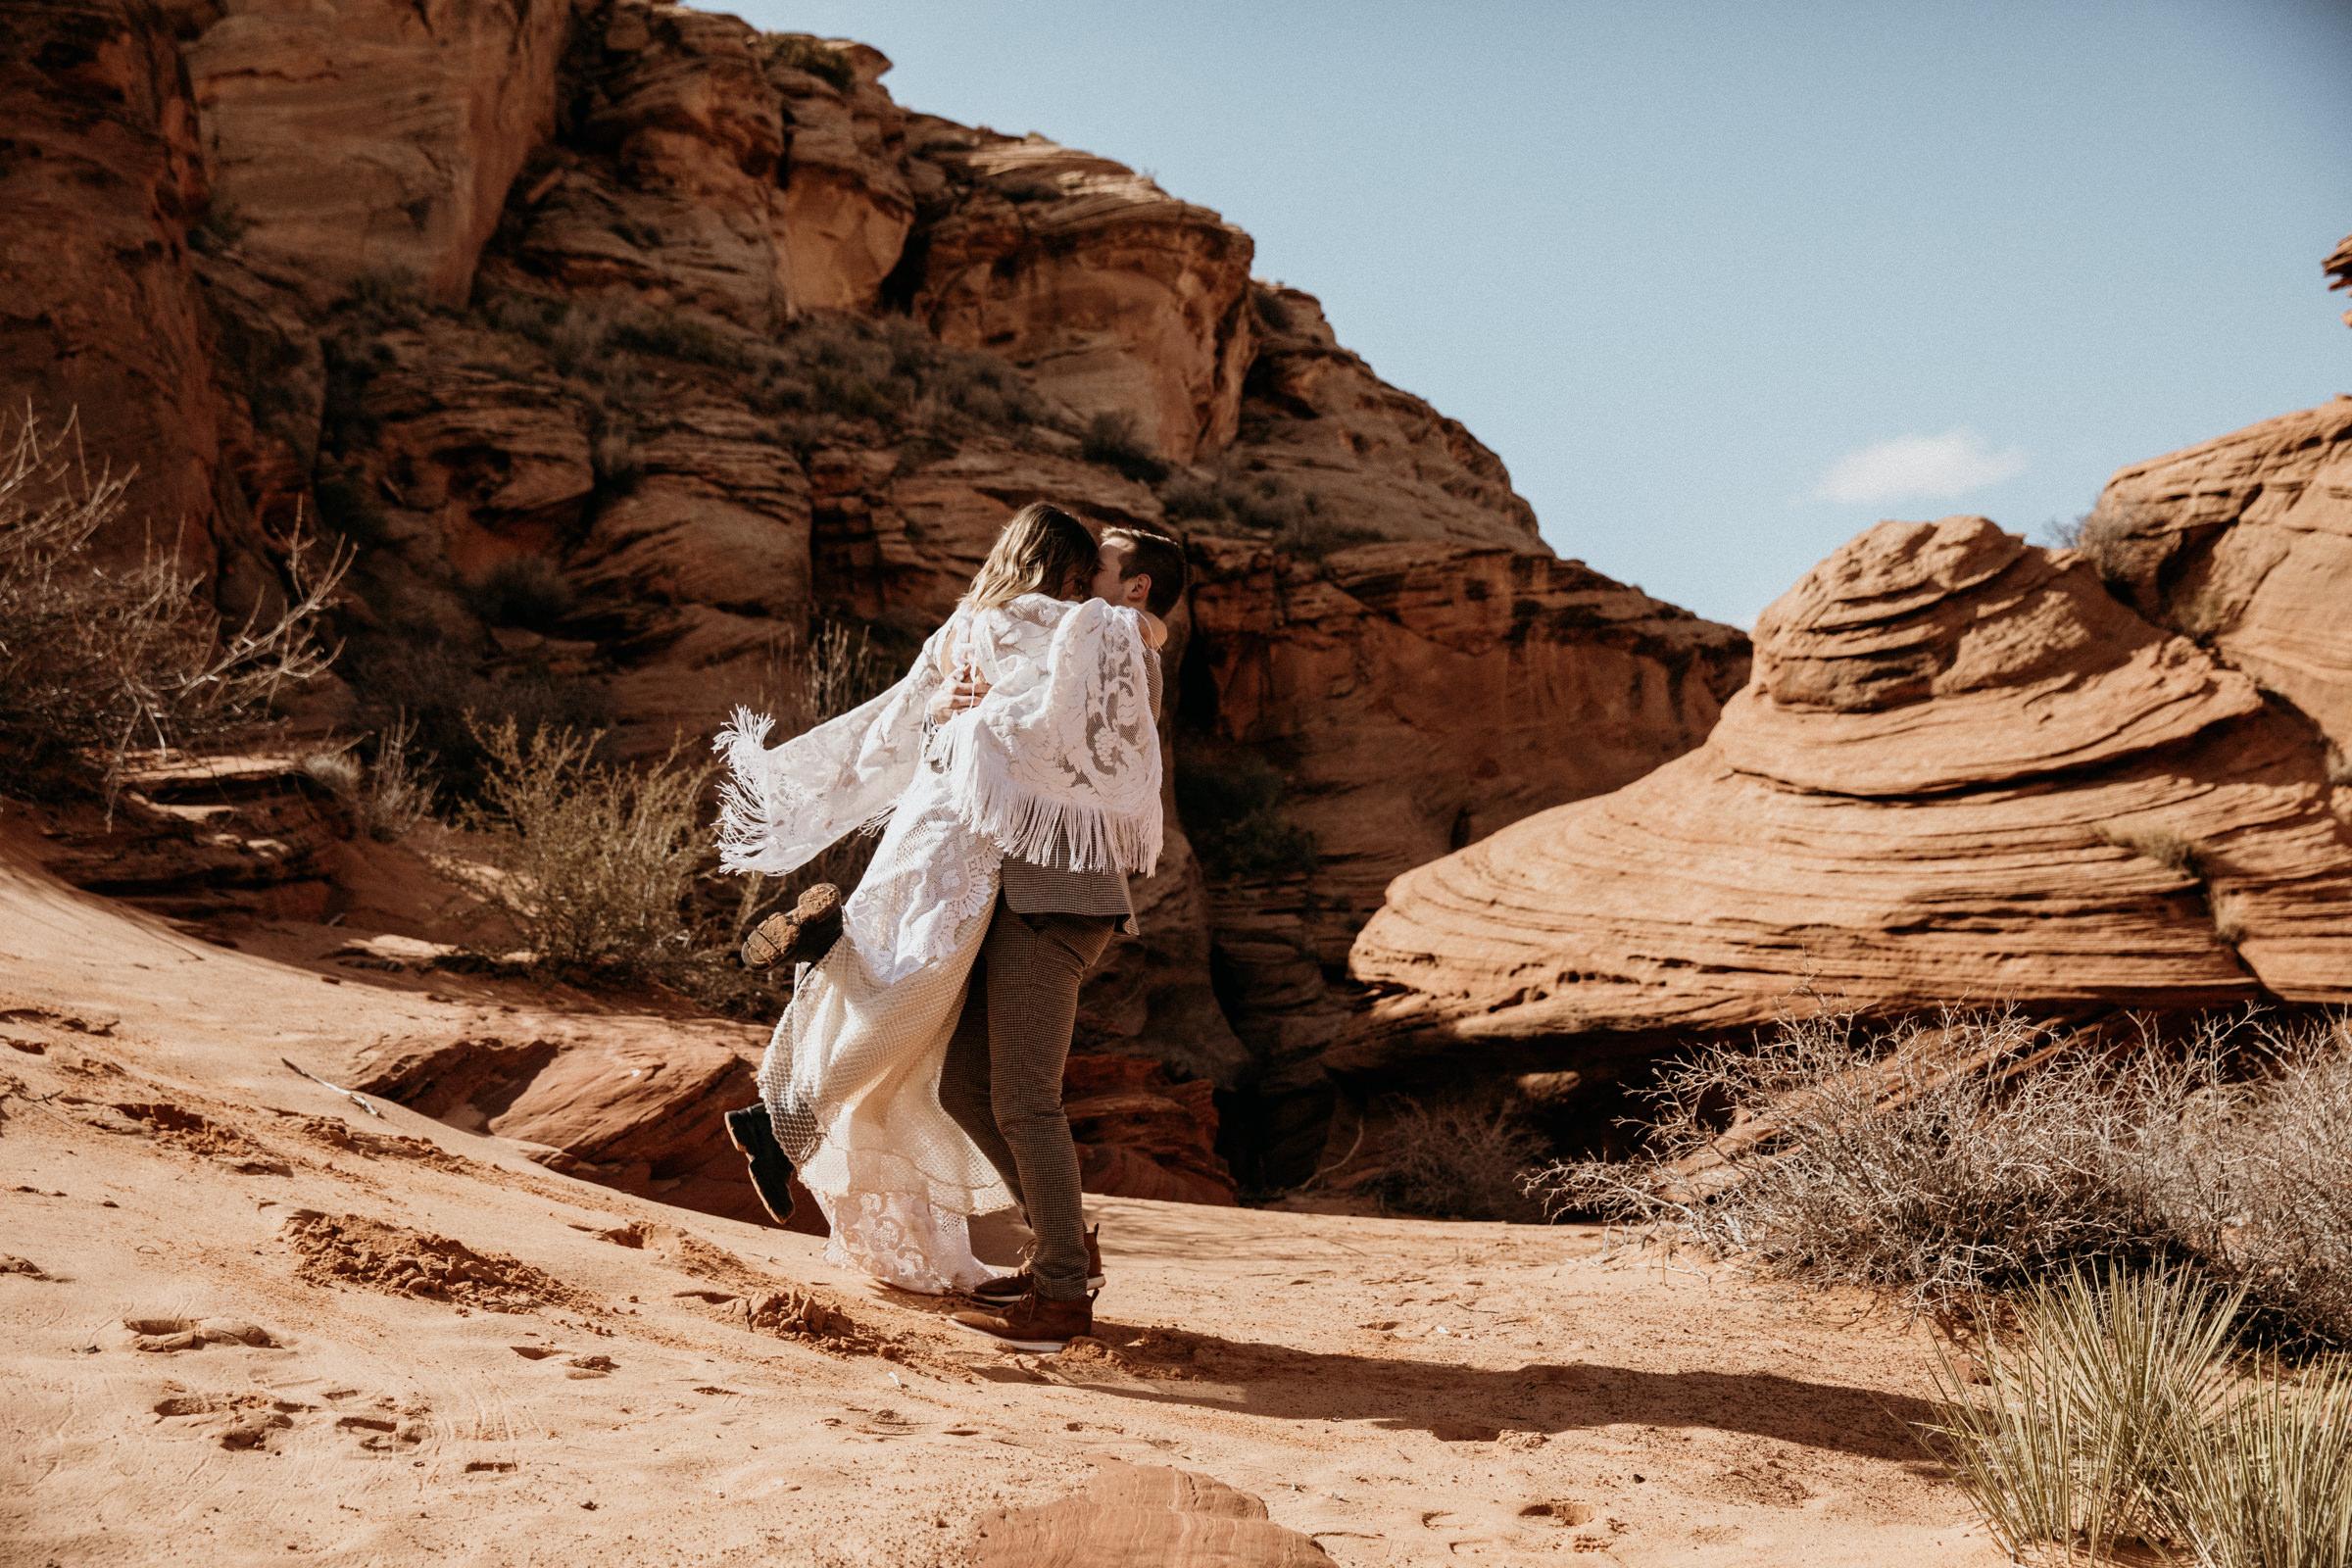 vintage-reclamation-lace-wedding-dress-in-desert.jpg